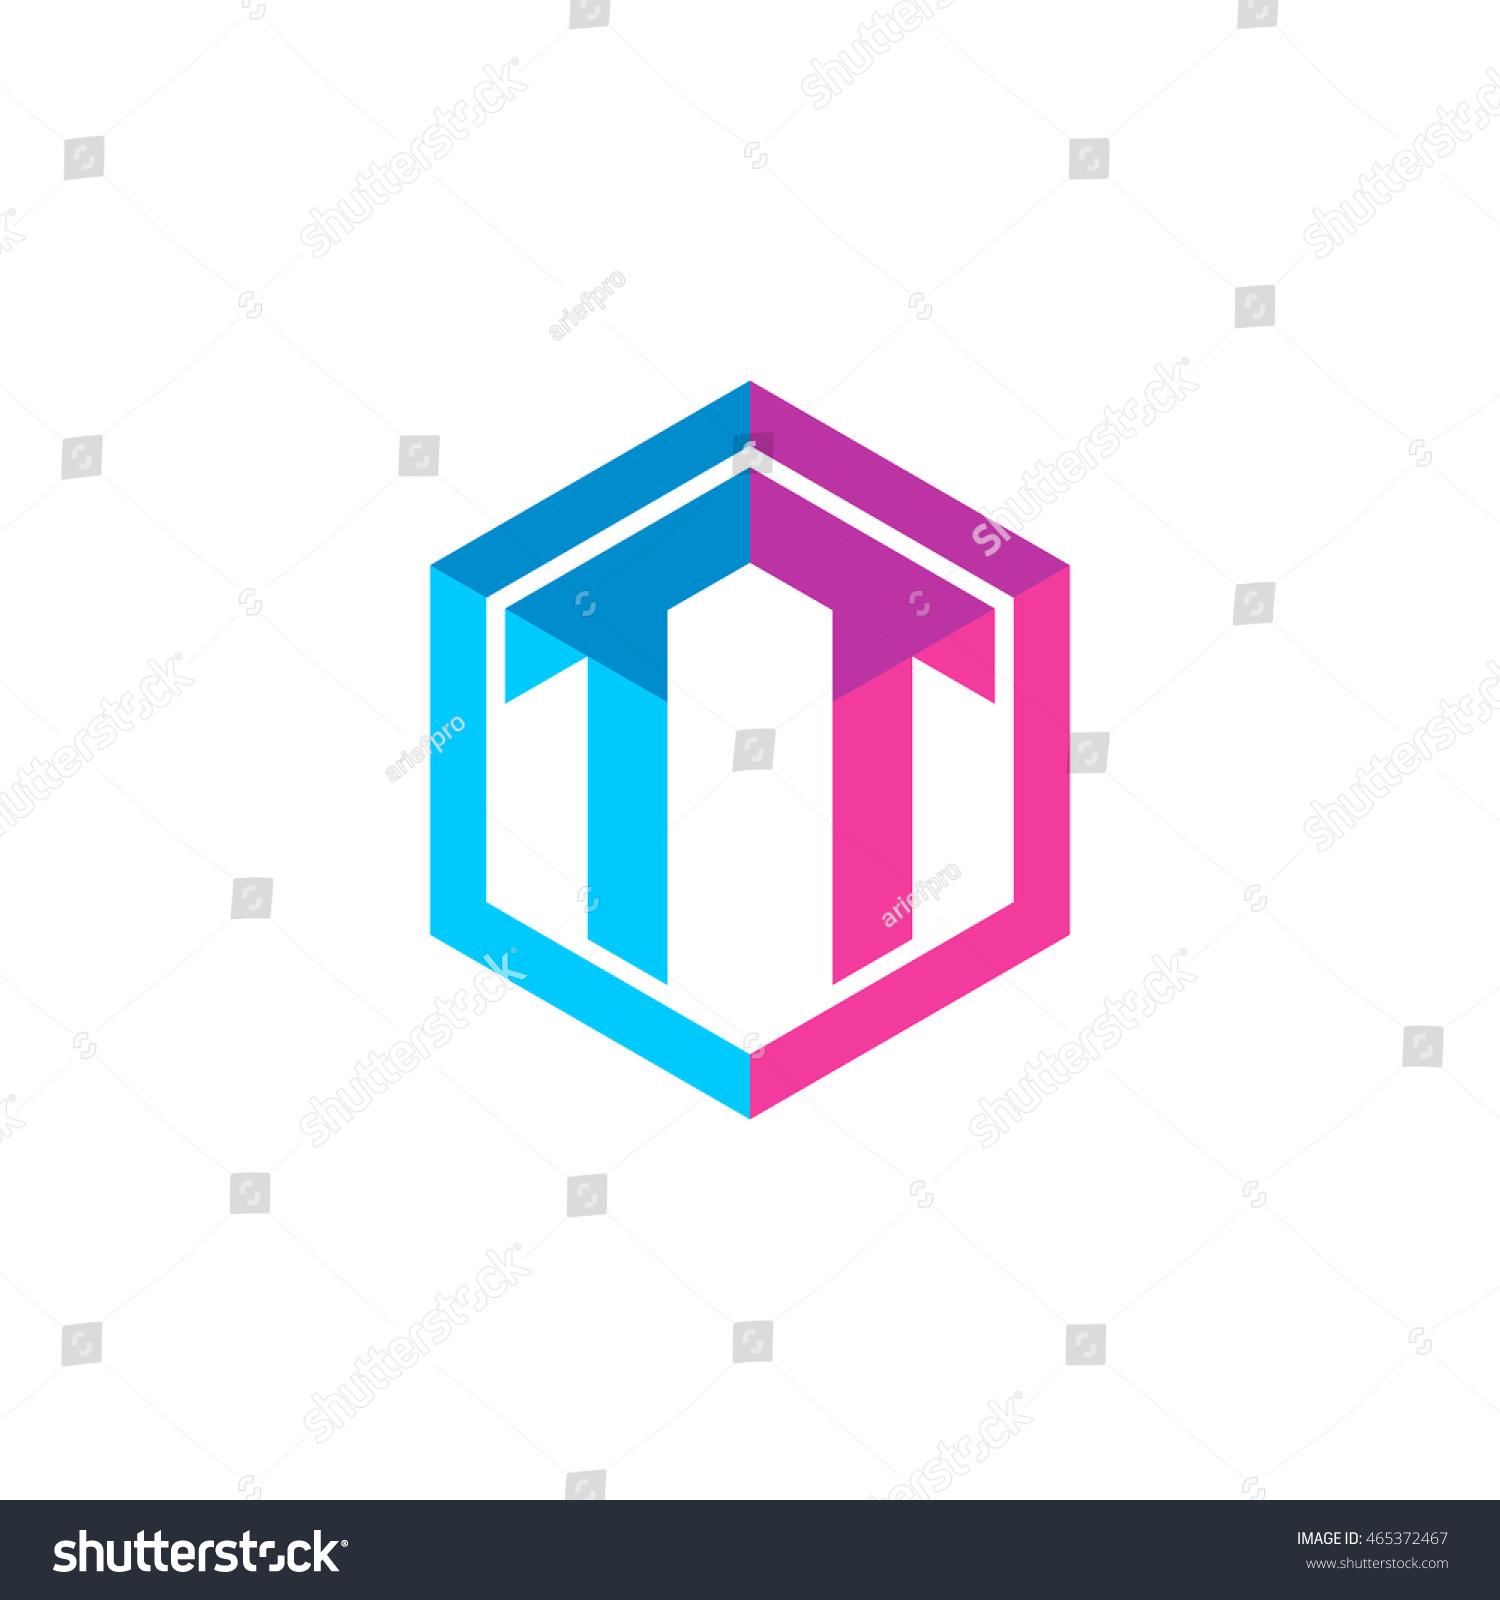 Tj initial luxury ornament monogram logo stock vector - Initial Letters Tt Hexagon Box Shape Logo Blue Pink Purple